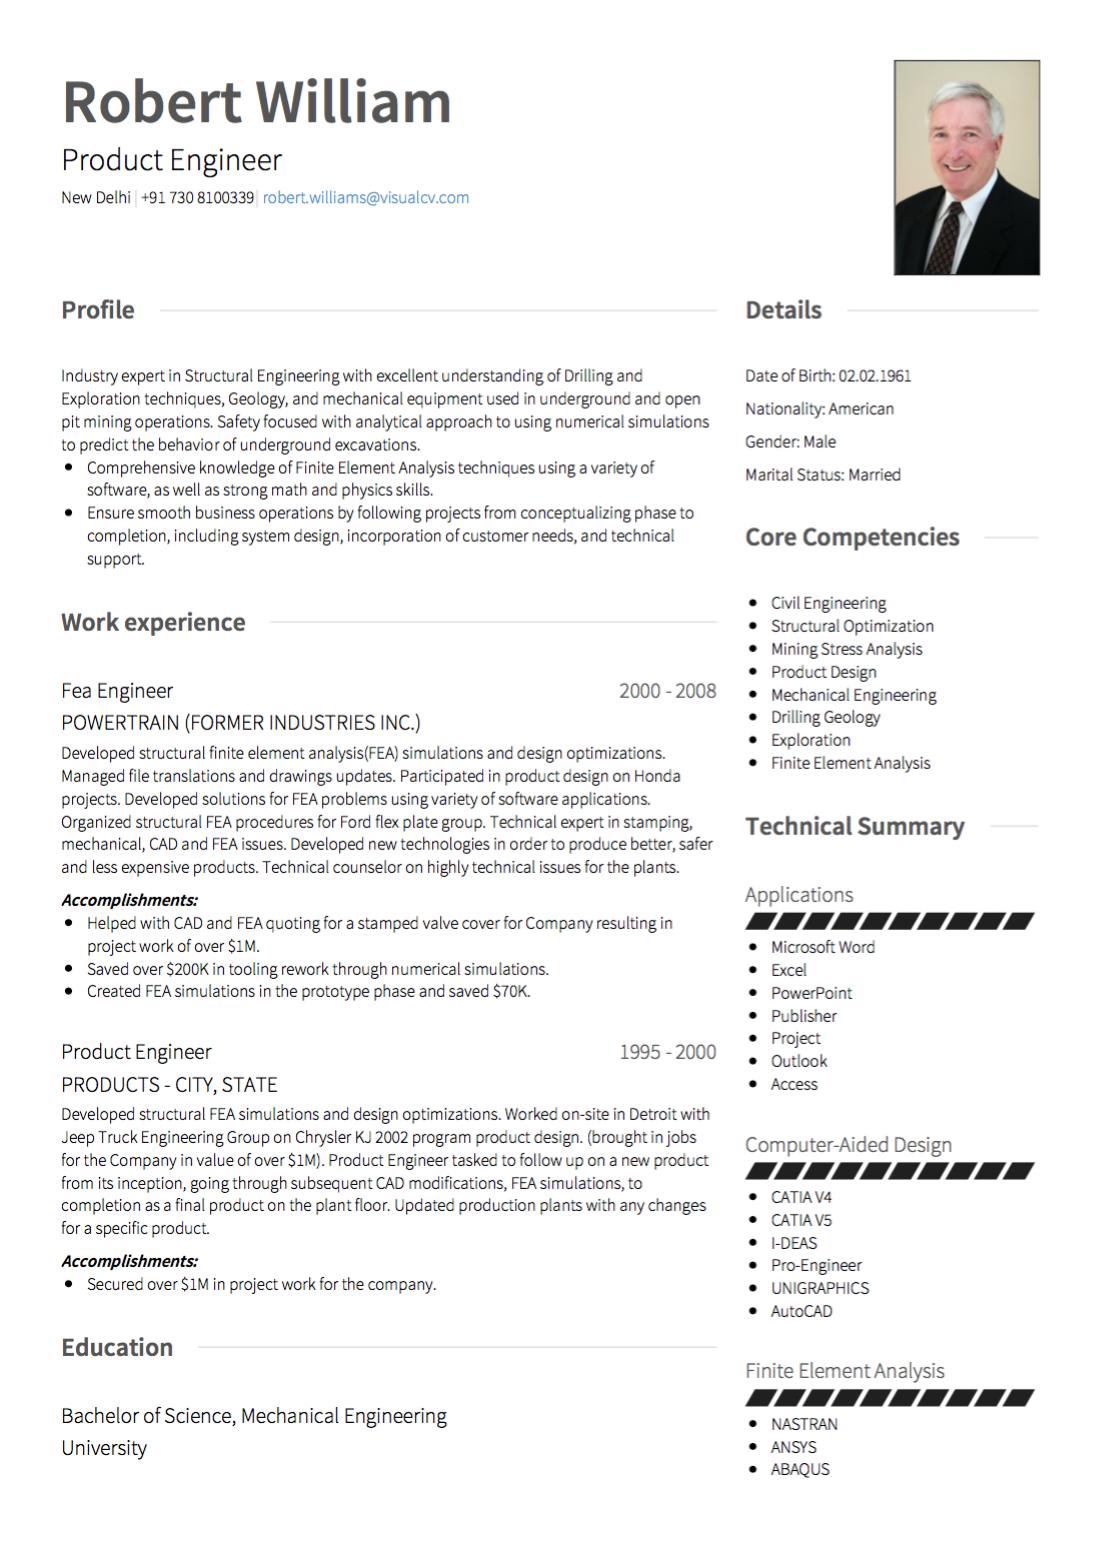 Swiss CV Image